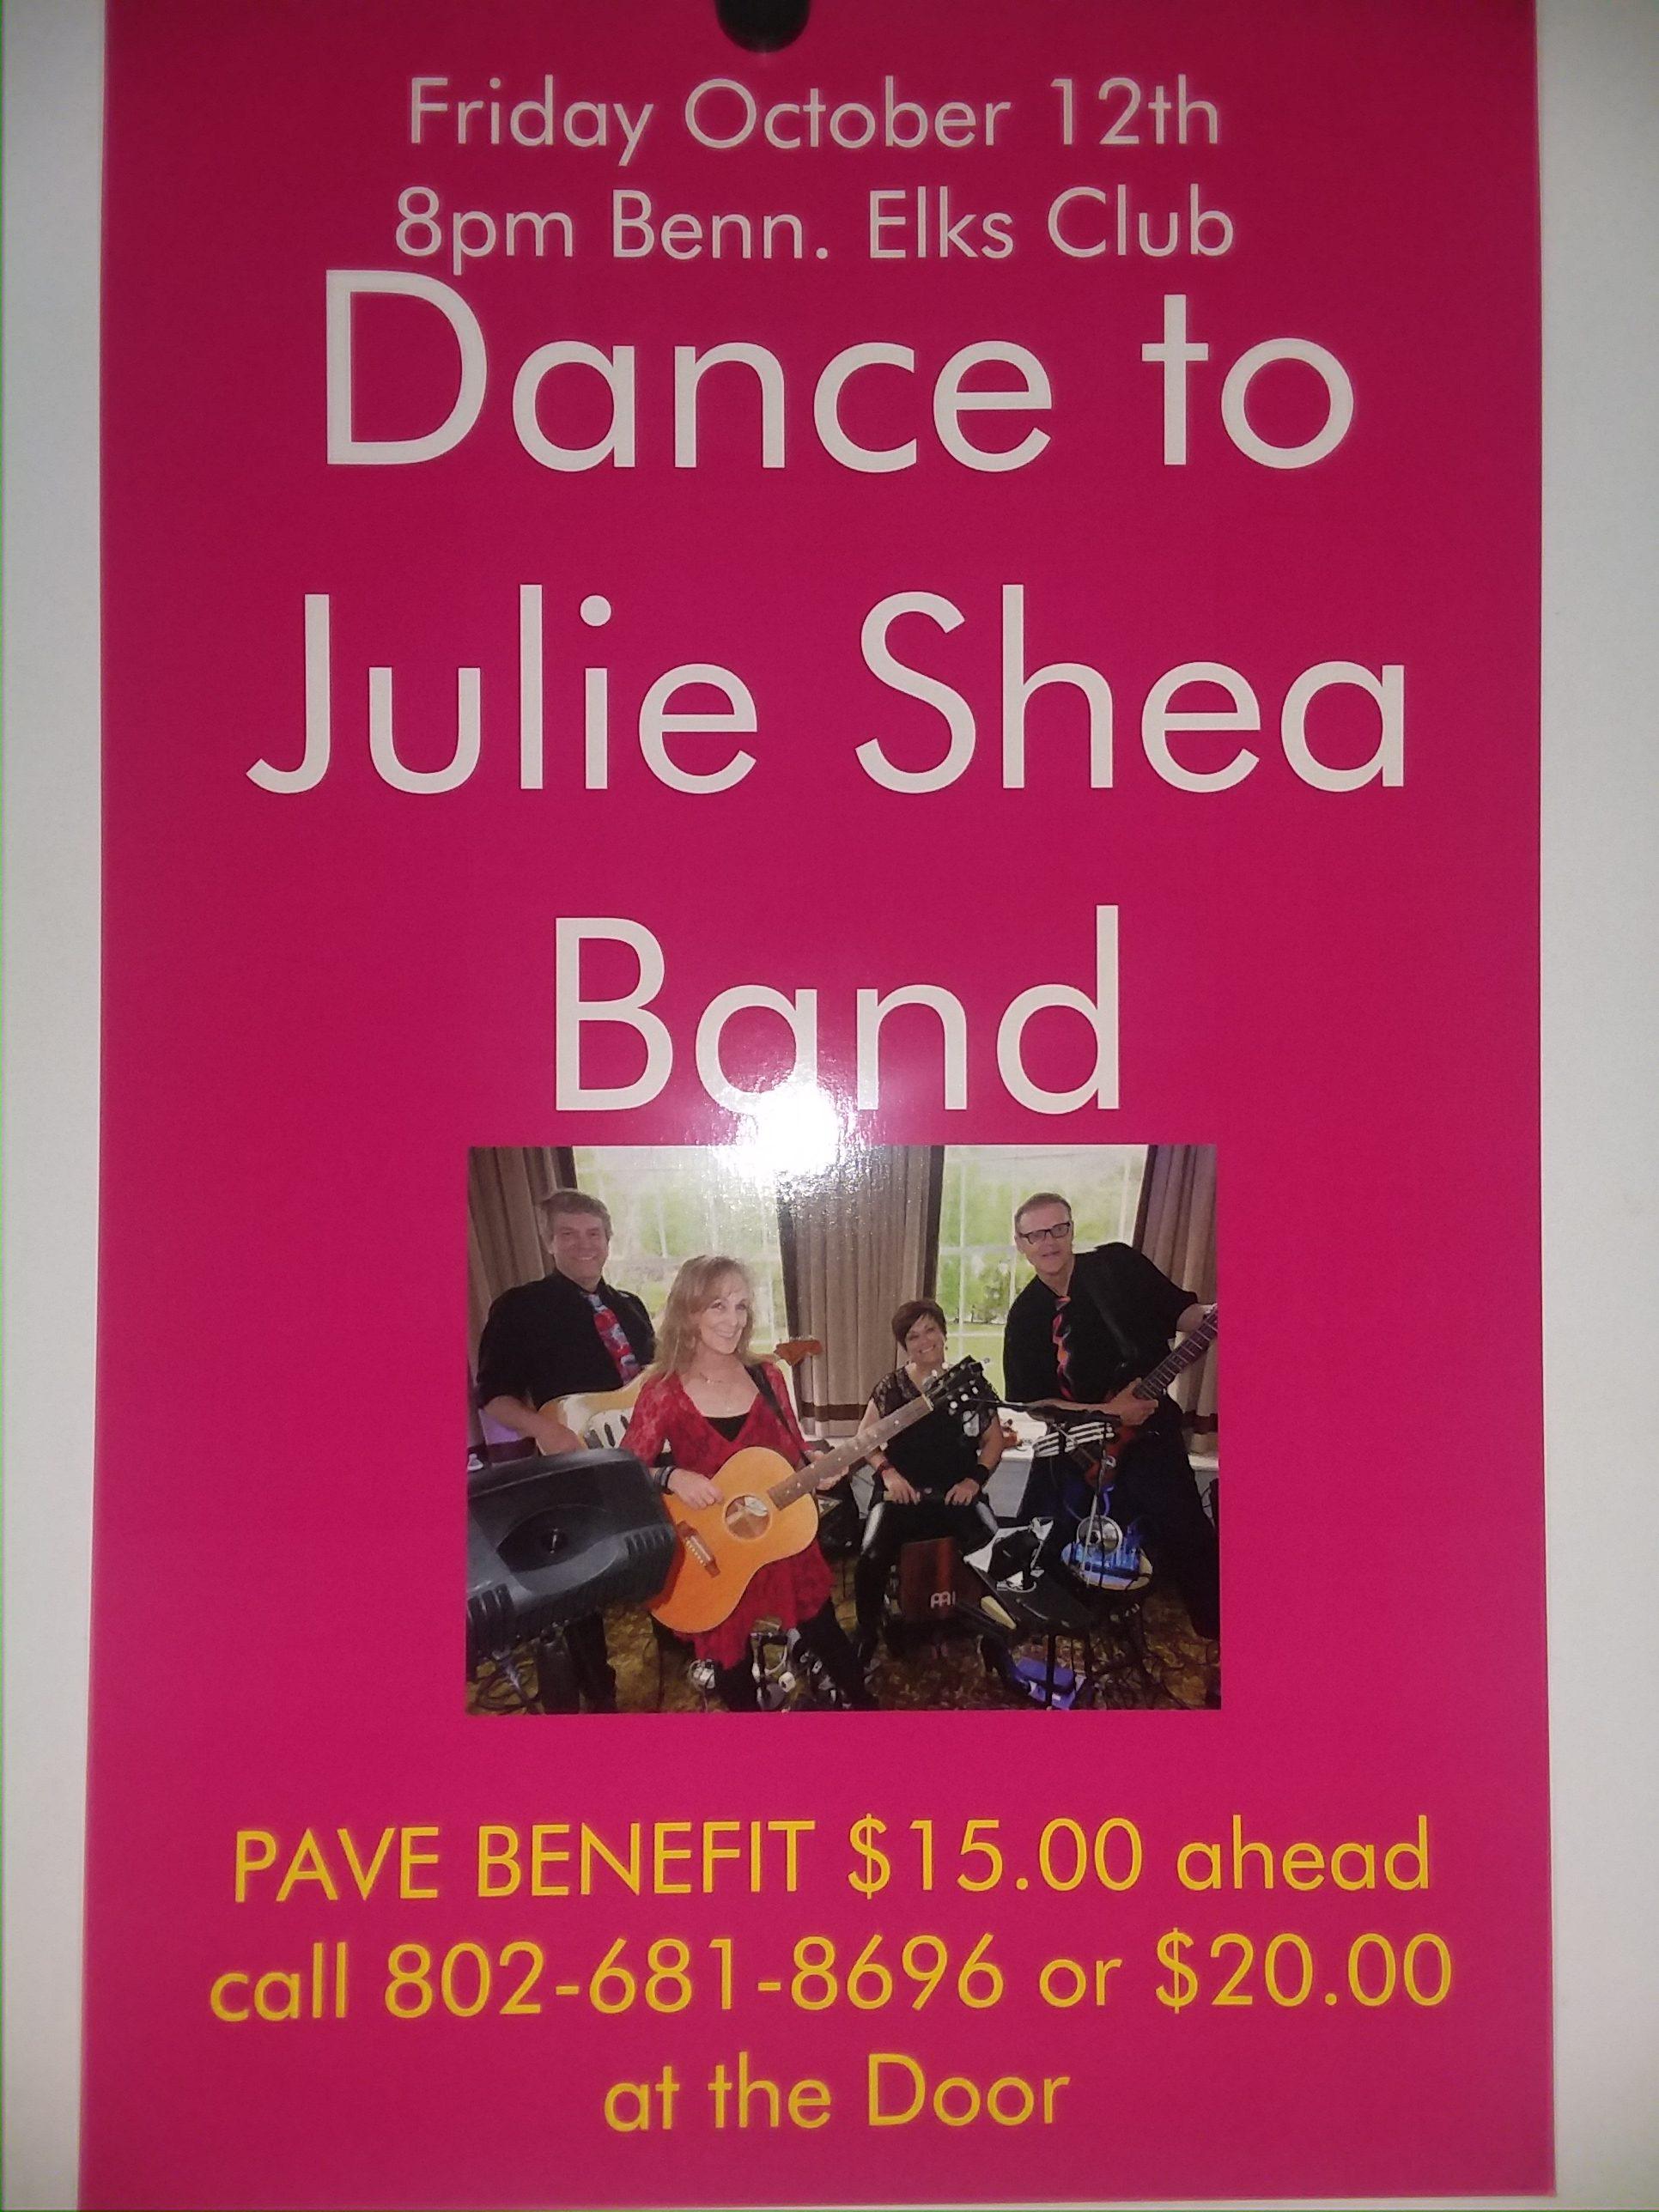 PAVE'S Dance Benefit